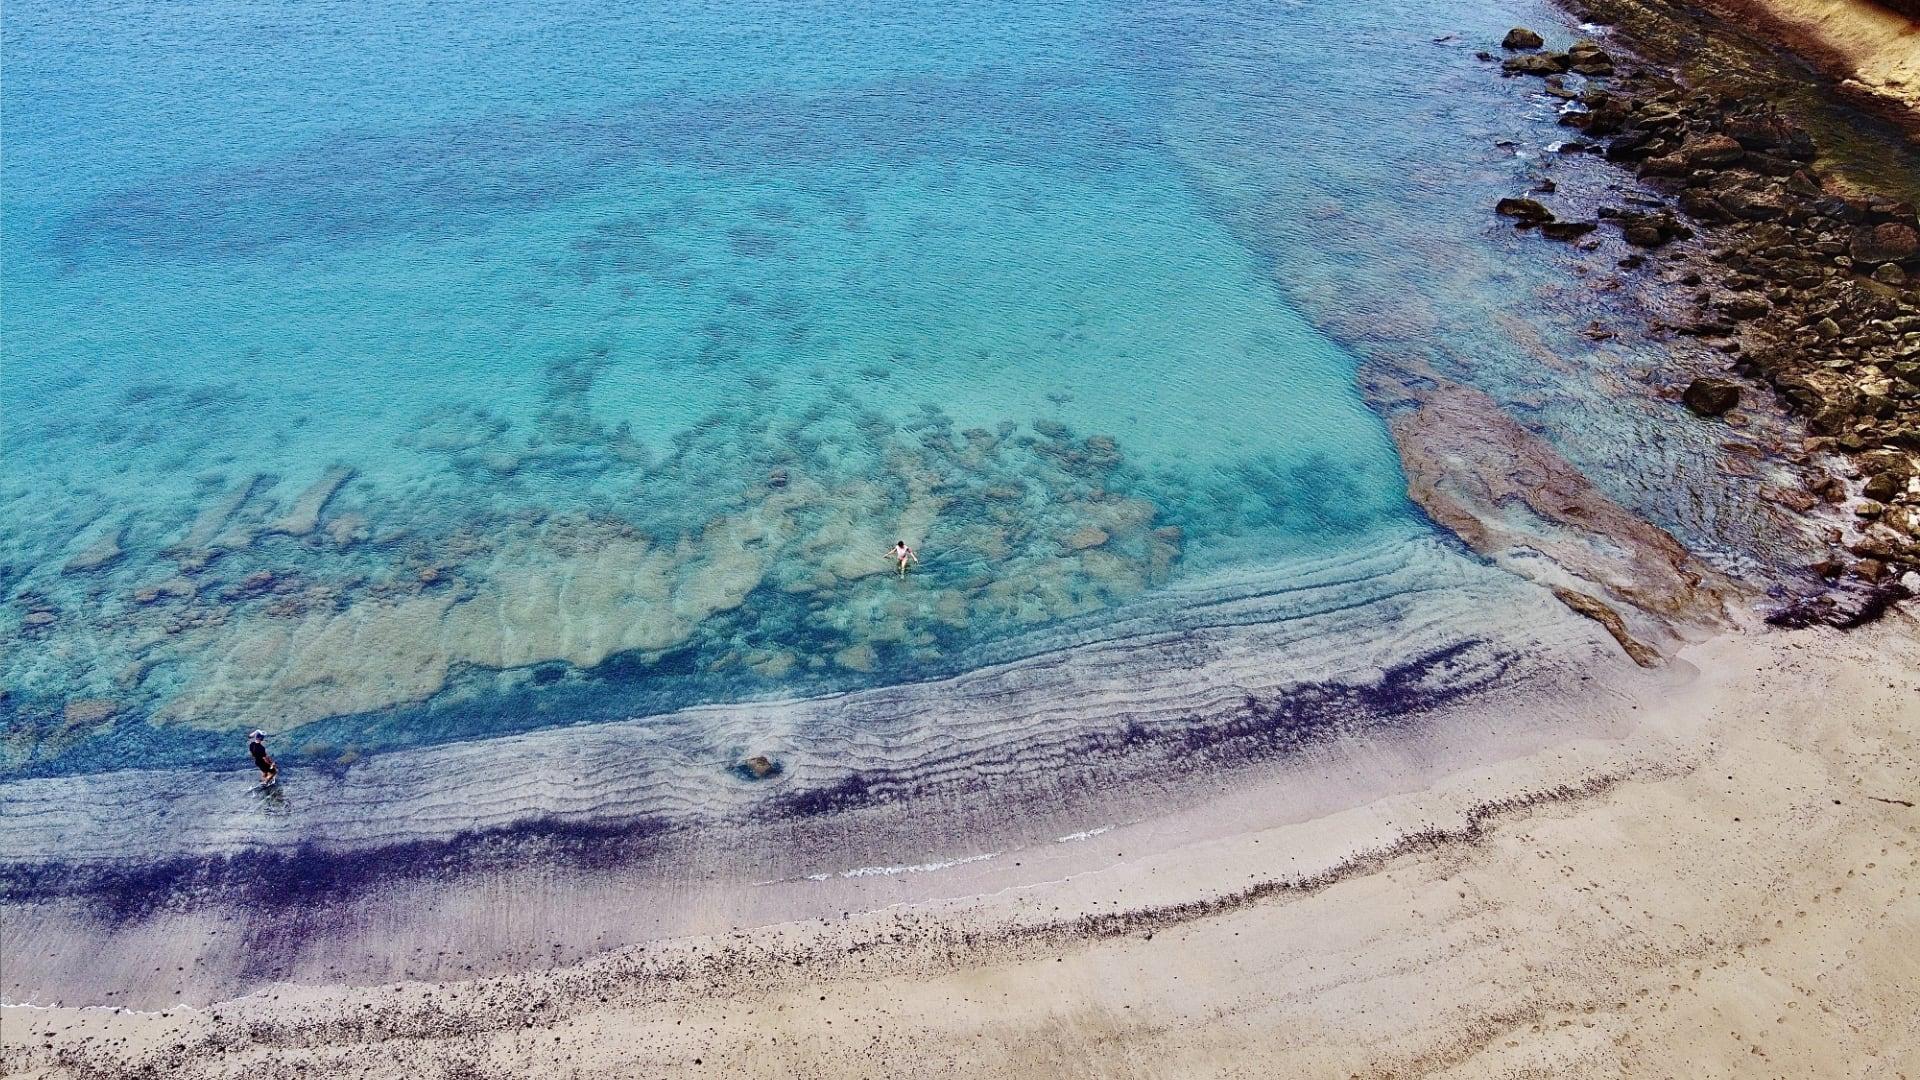 drone photo of a stunning beach in fuerteventura